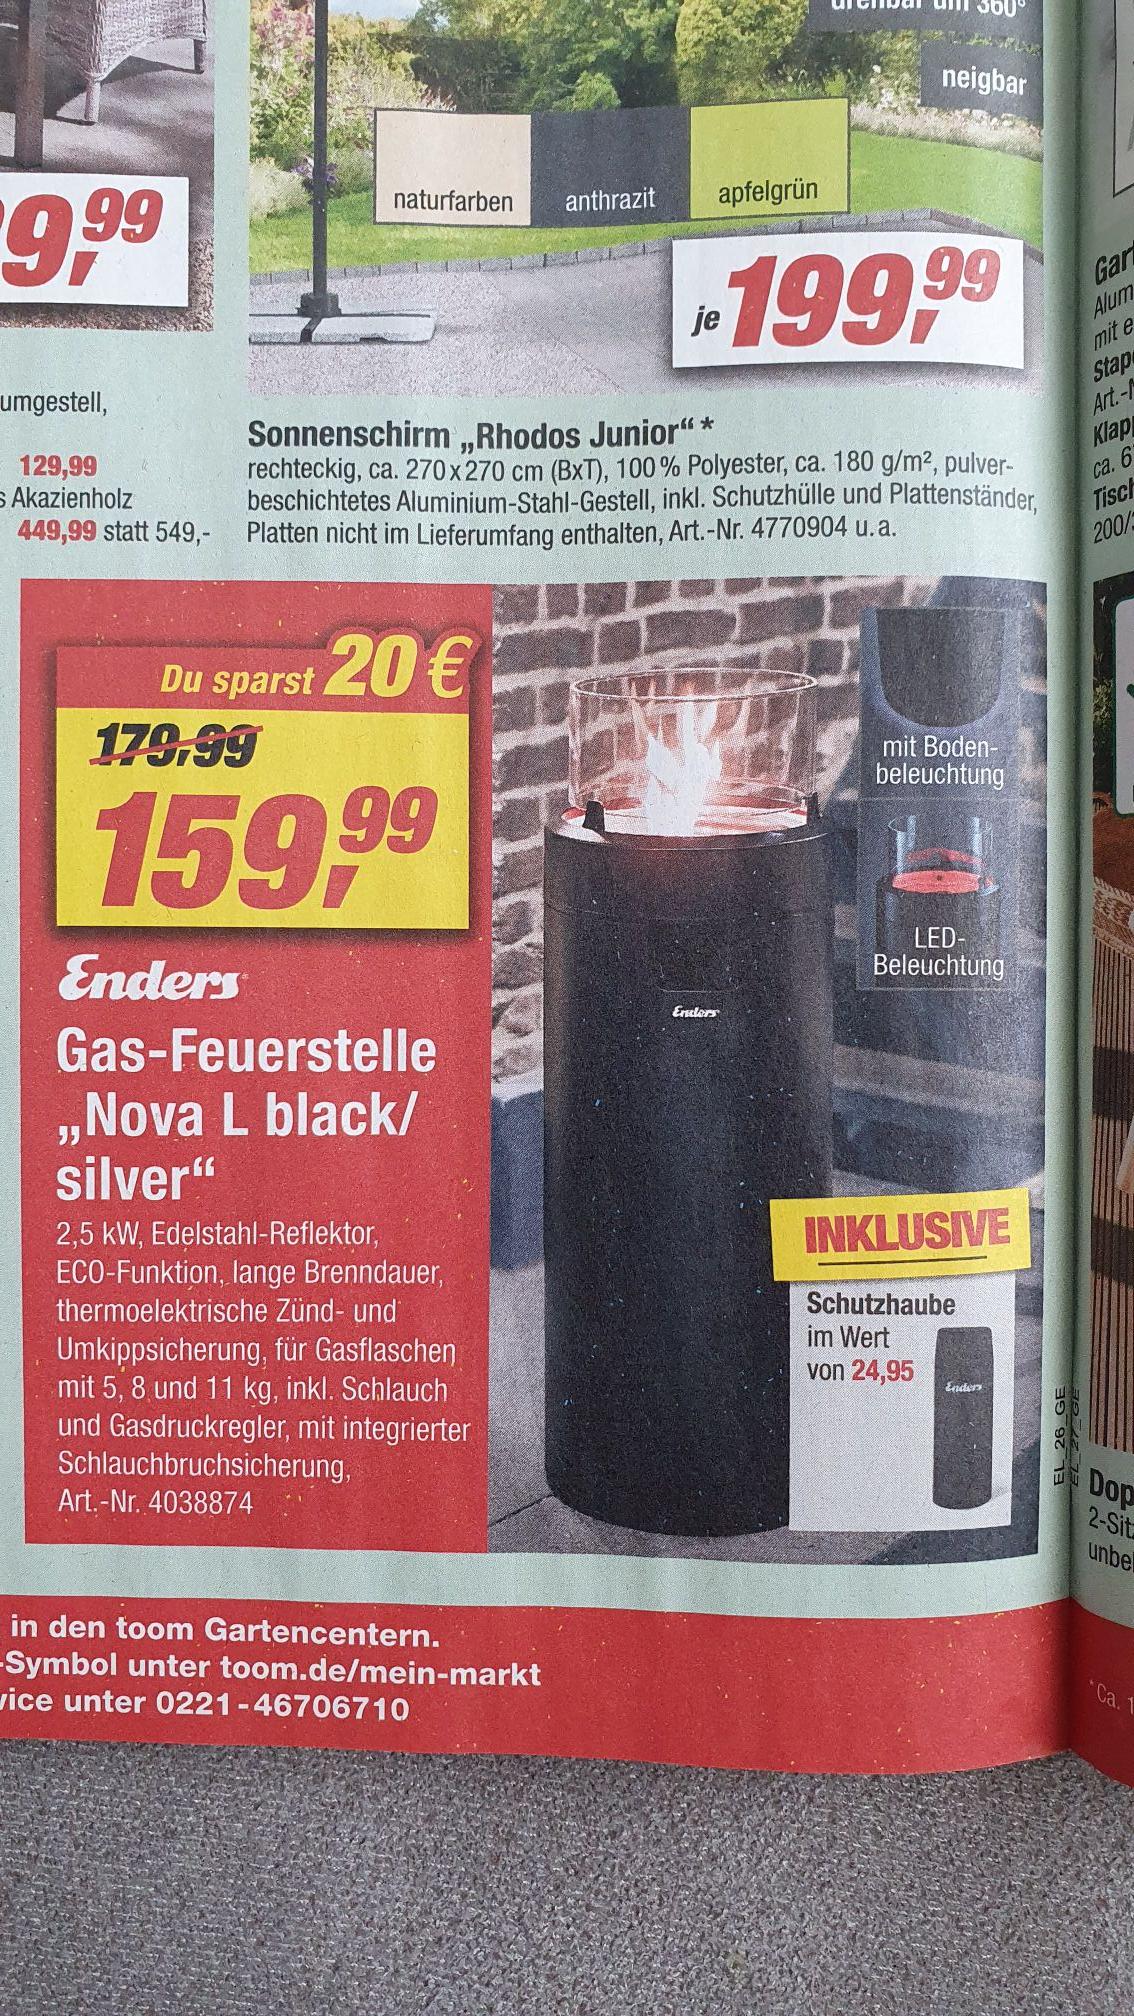 Enders Gas-Feuerstelle Nova L black/silver